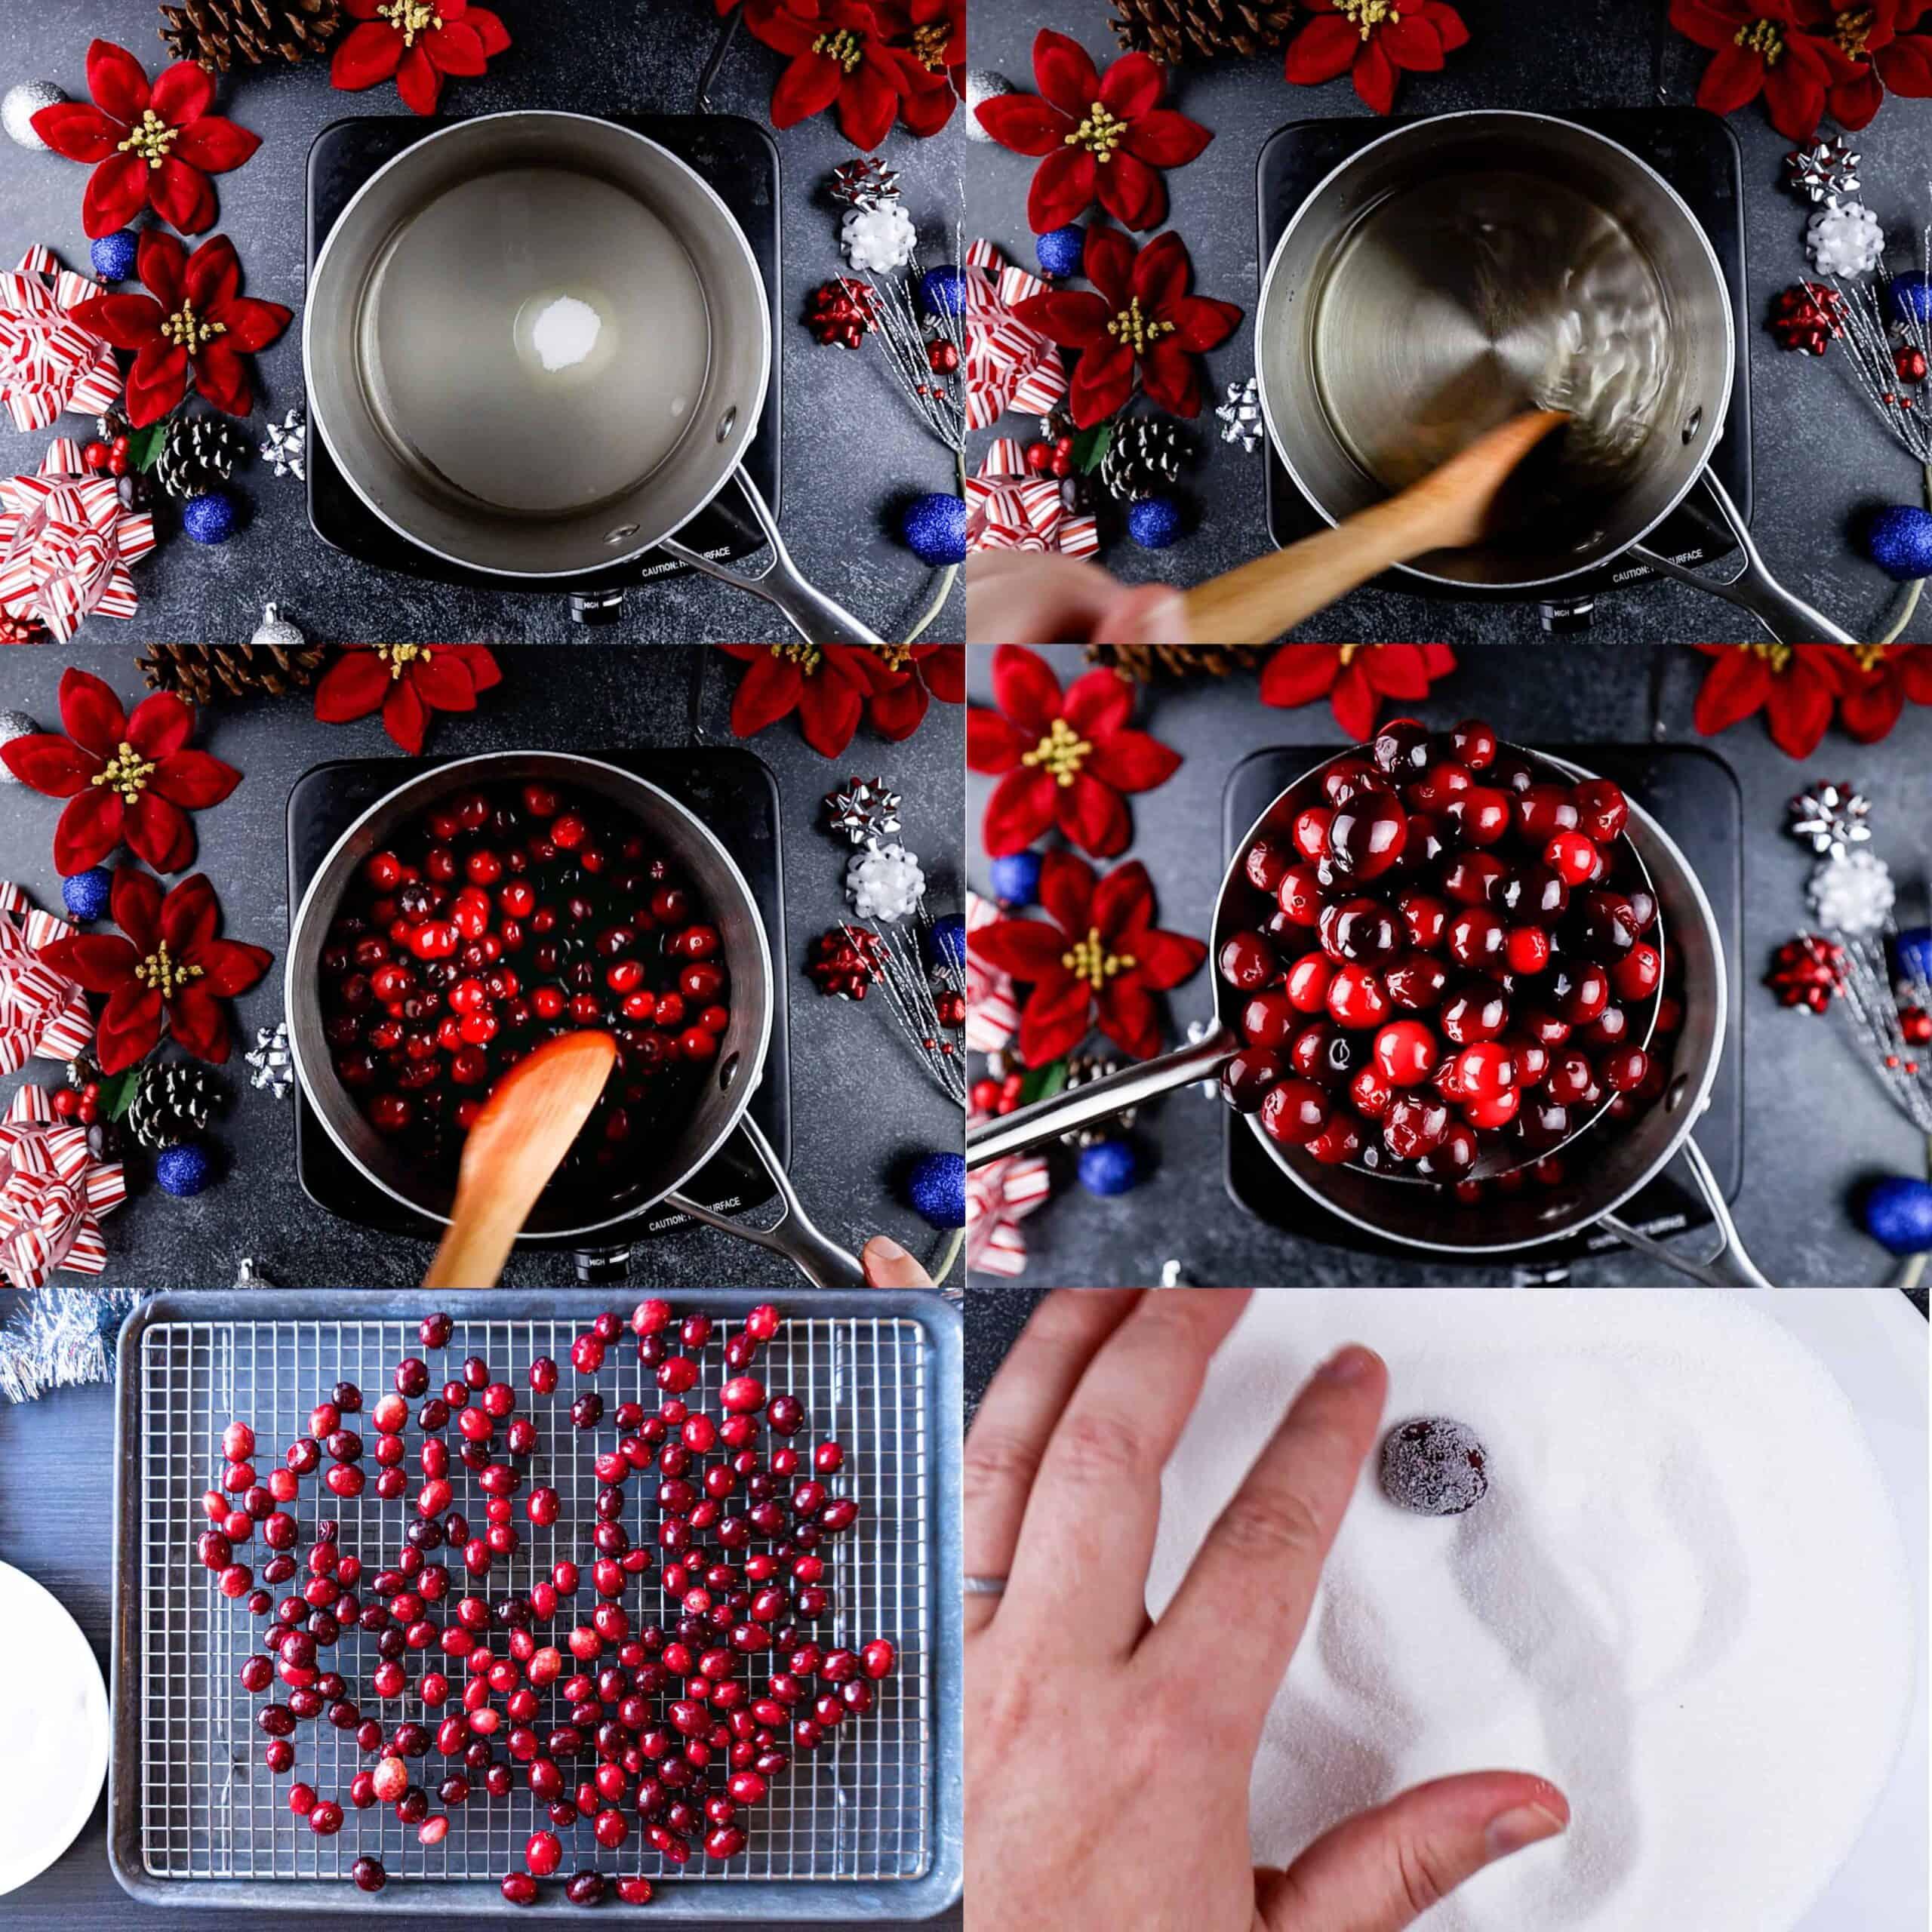 process shots of making sugared cranberries